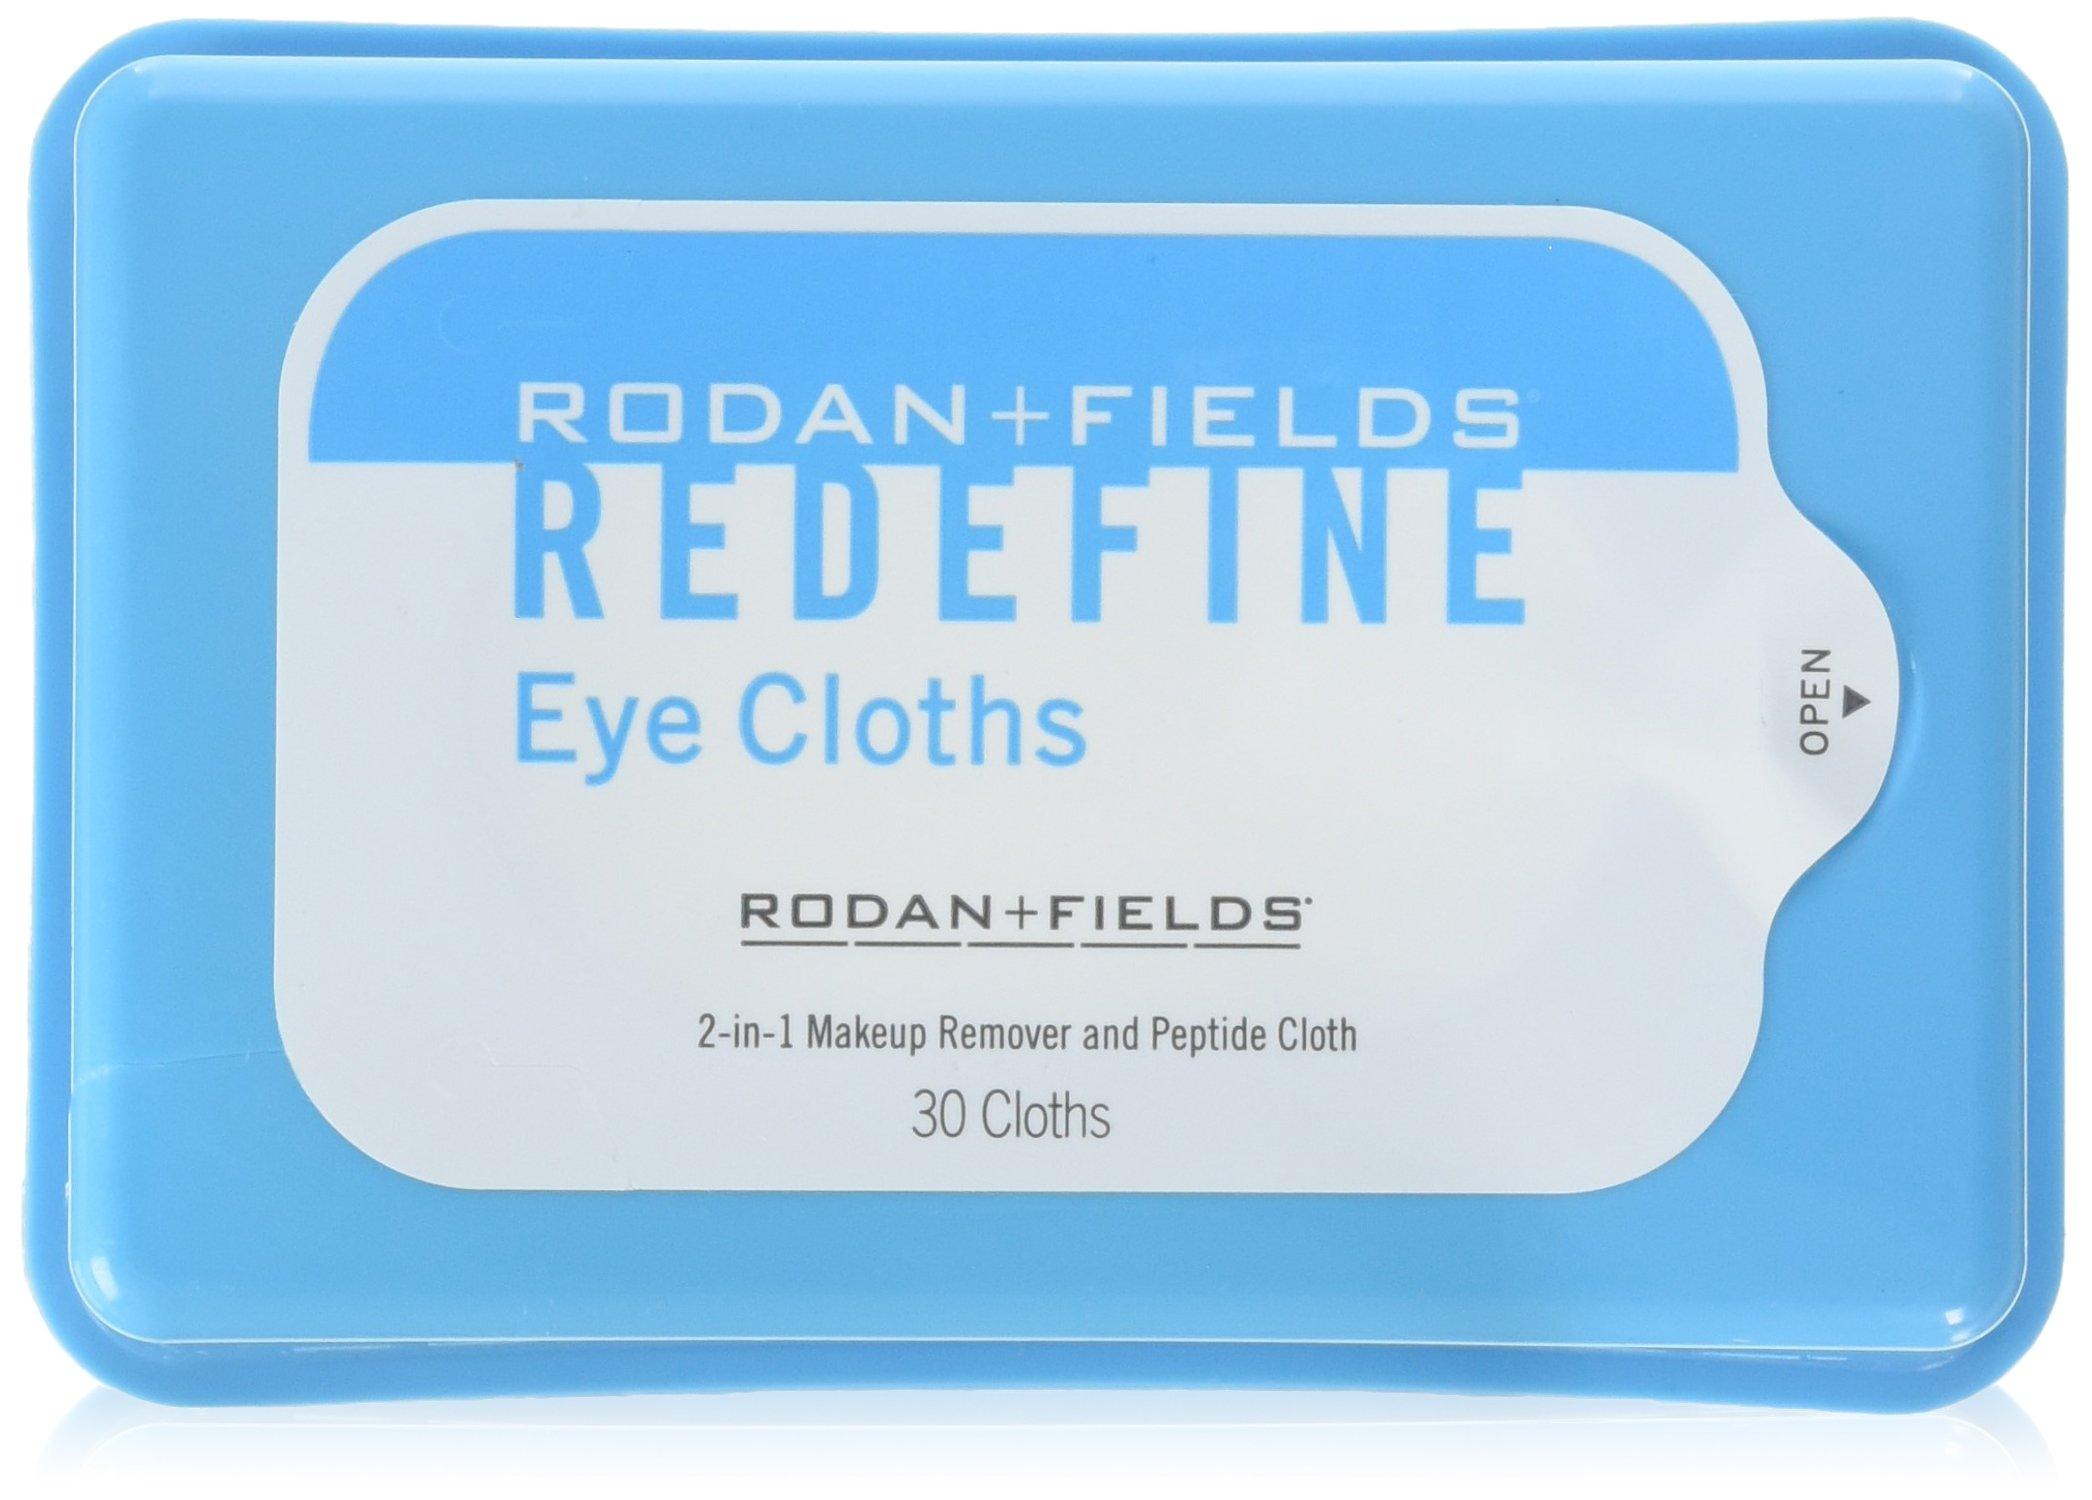 Rodan + Fields Redefine Eye Cloths